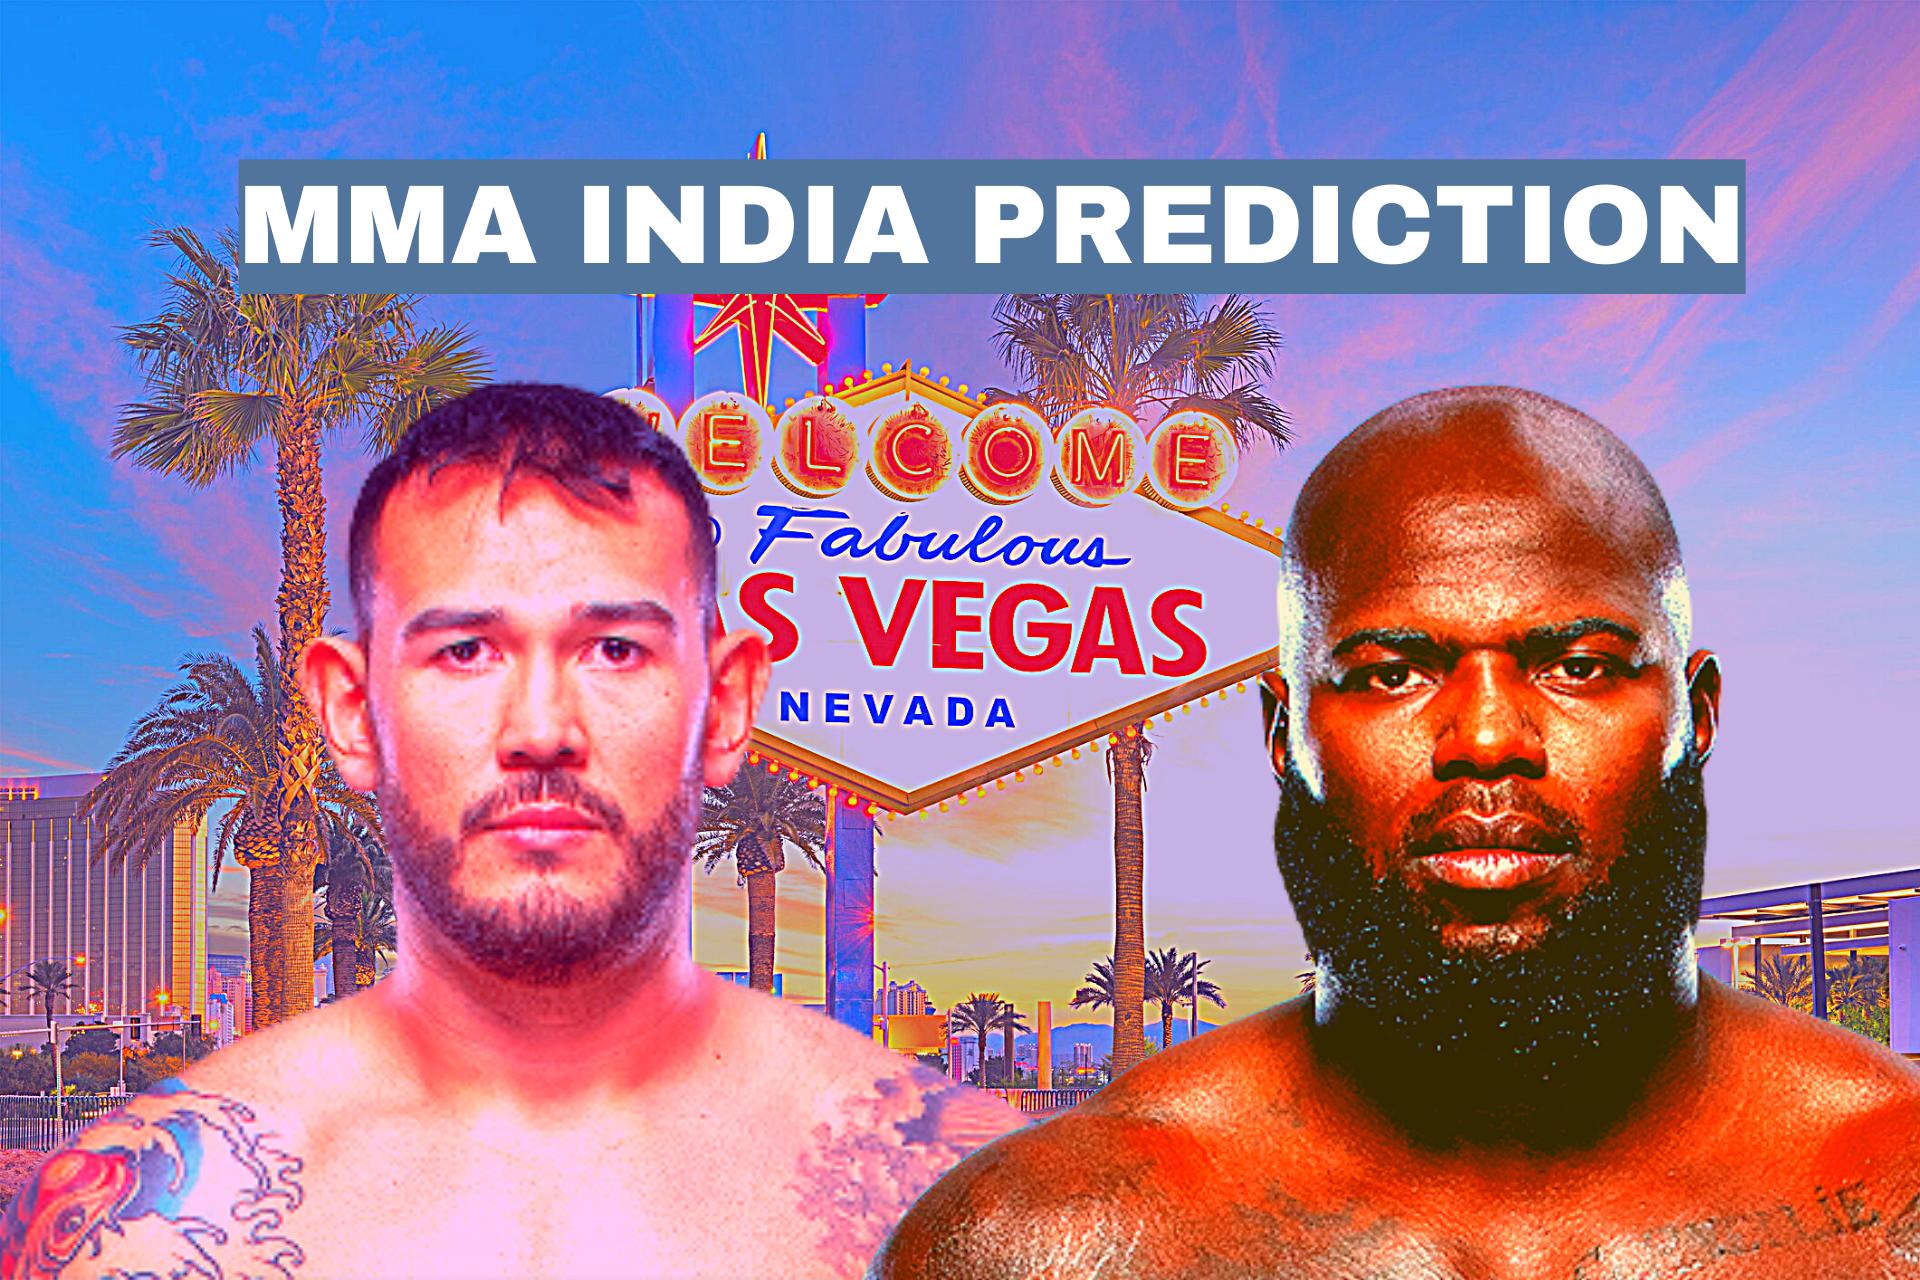 UFC Vegas 28: Jairzinho Rozenstruik vs Augusto Sakai Betting Odds and Prediction - Jairzinho